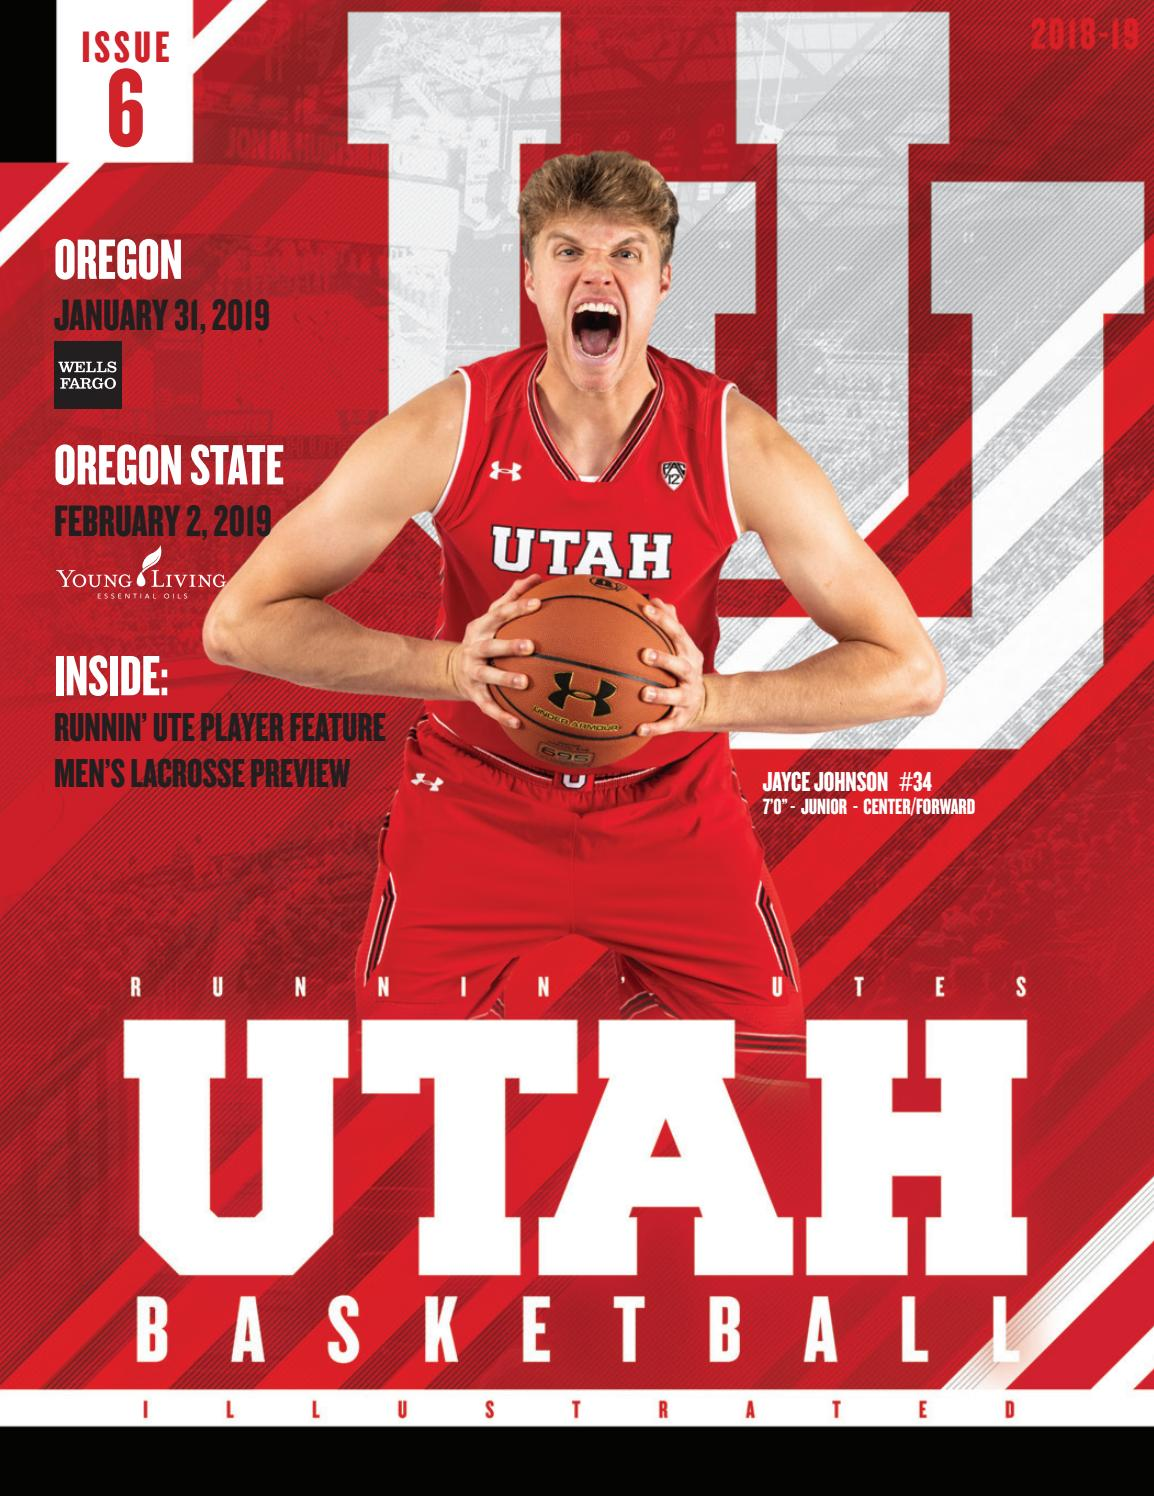 Utah Basketball 2018 19 By Mills Publishing Sports Issuu